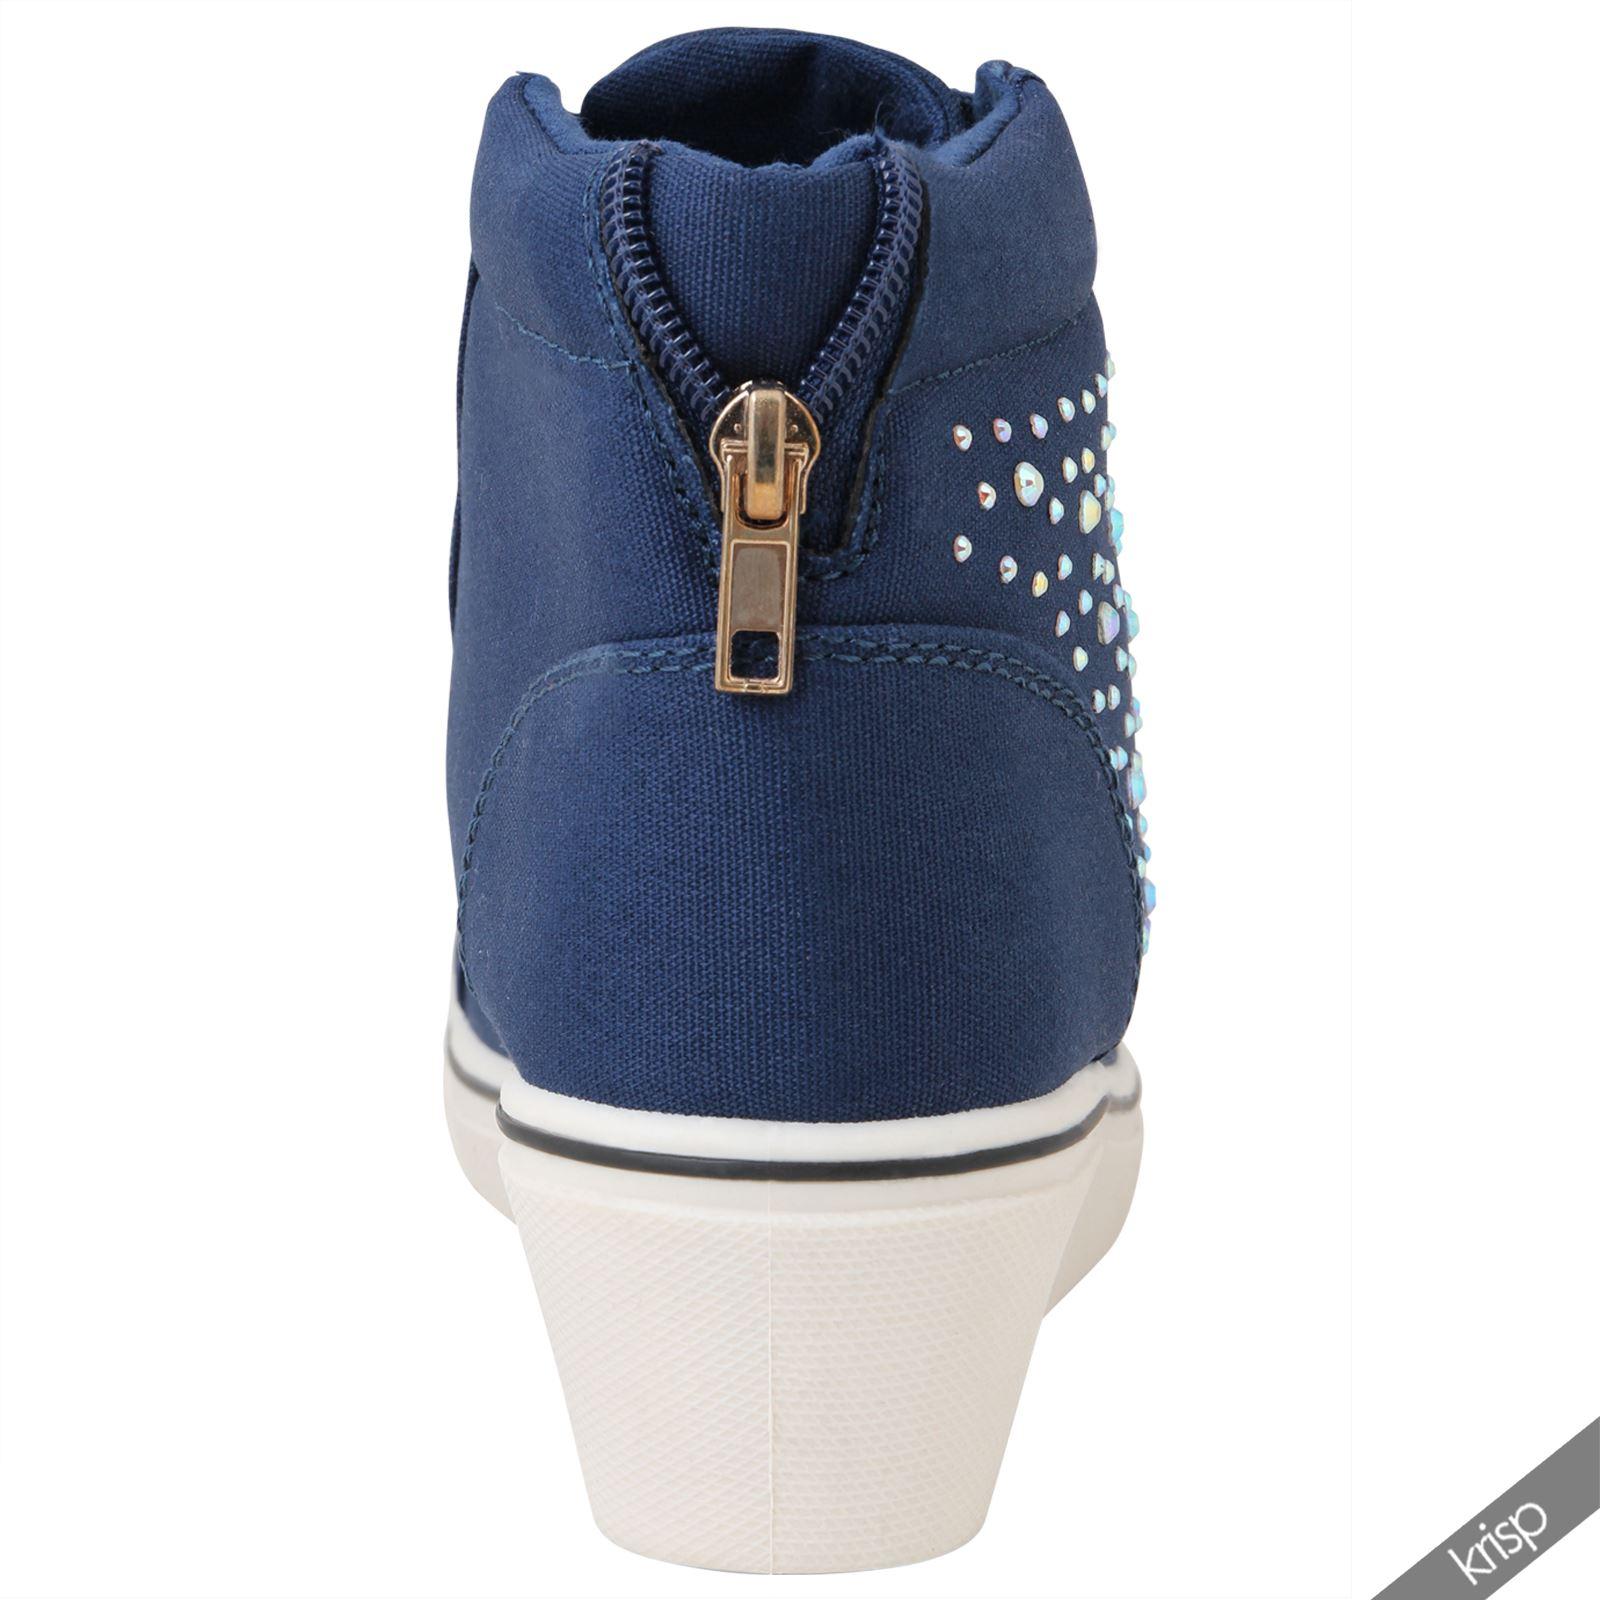 femmes baskets brillantes haut talon compens strass sneakers taille 36 41 ebay. Black Bedroom Furniture Sets. Home Design Ideas